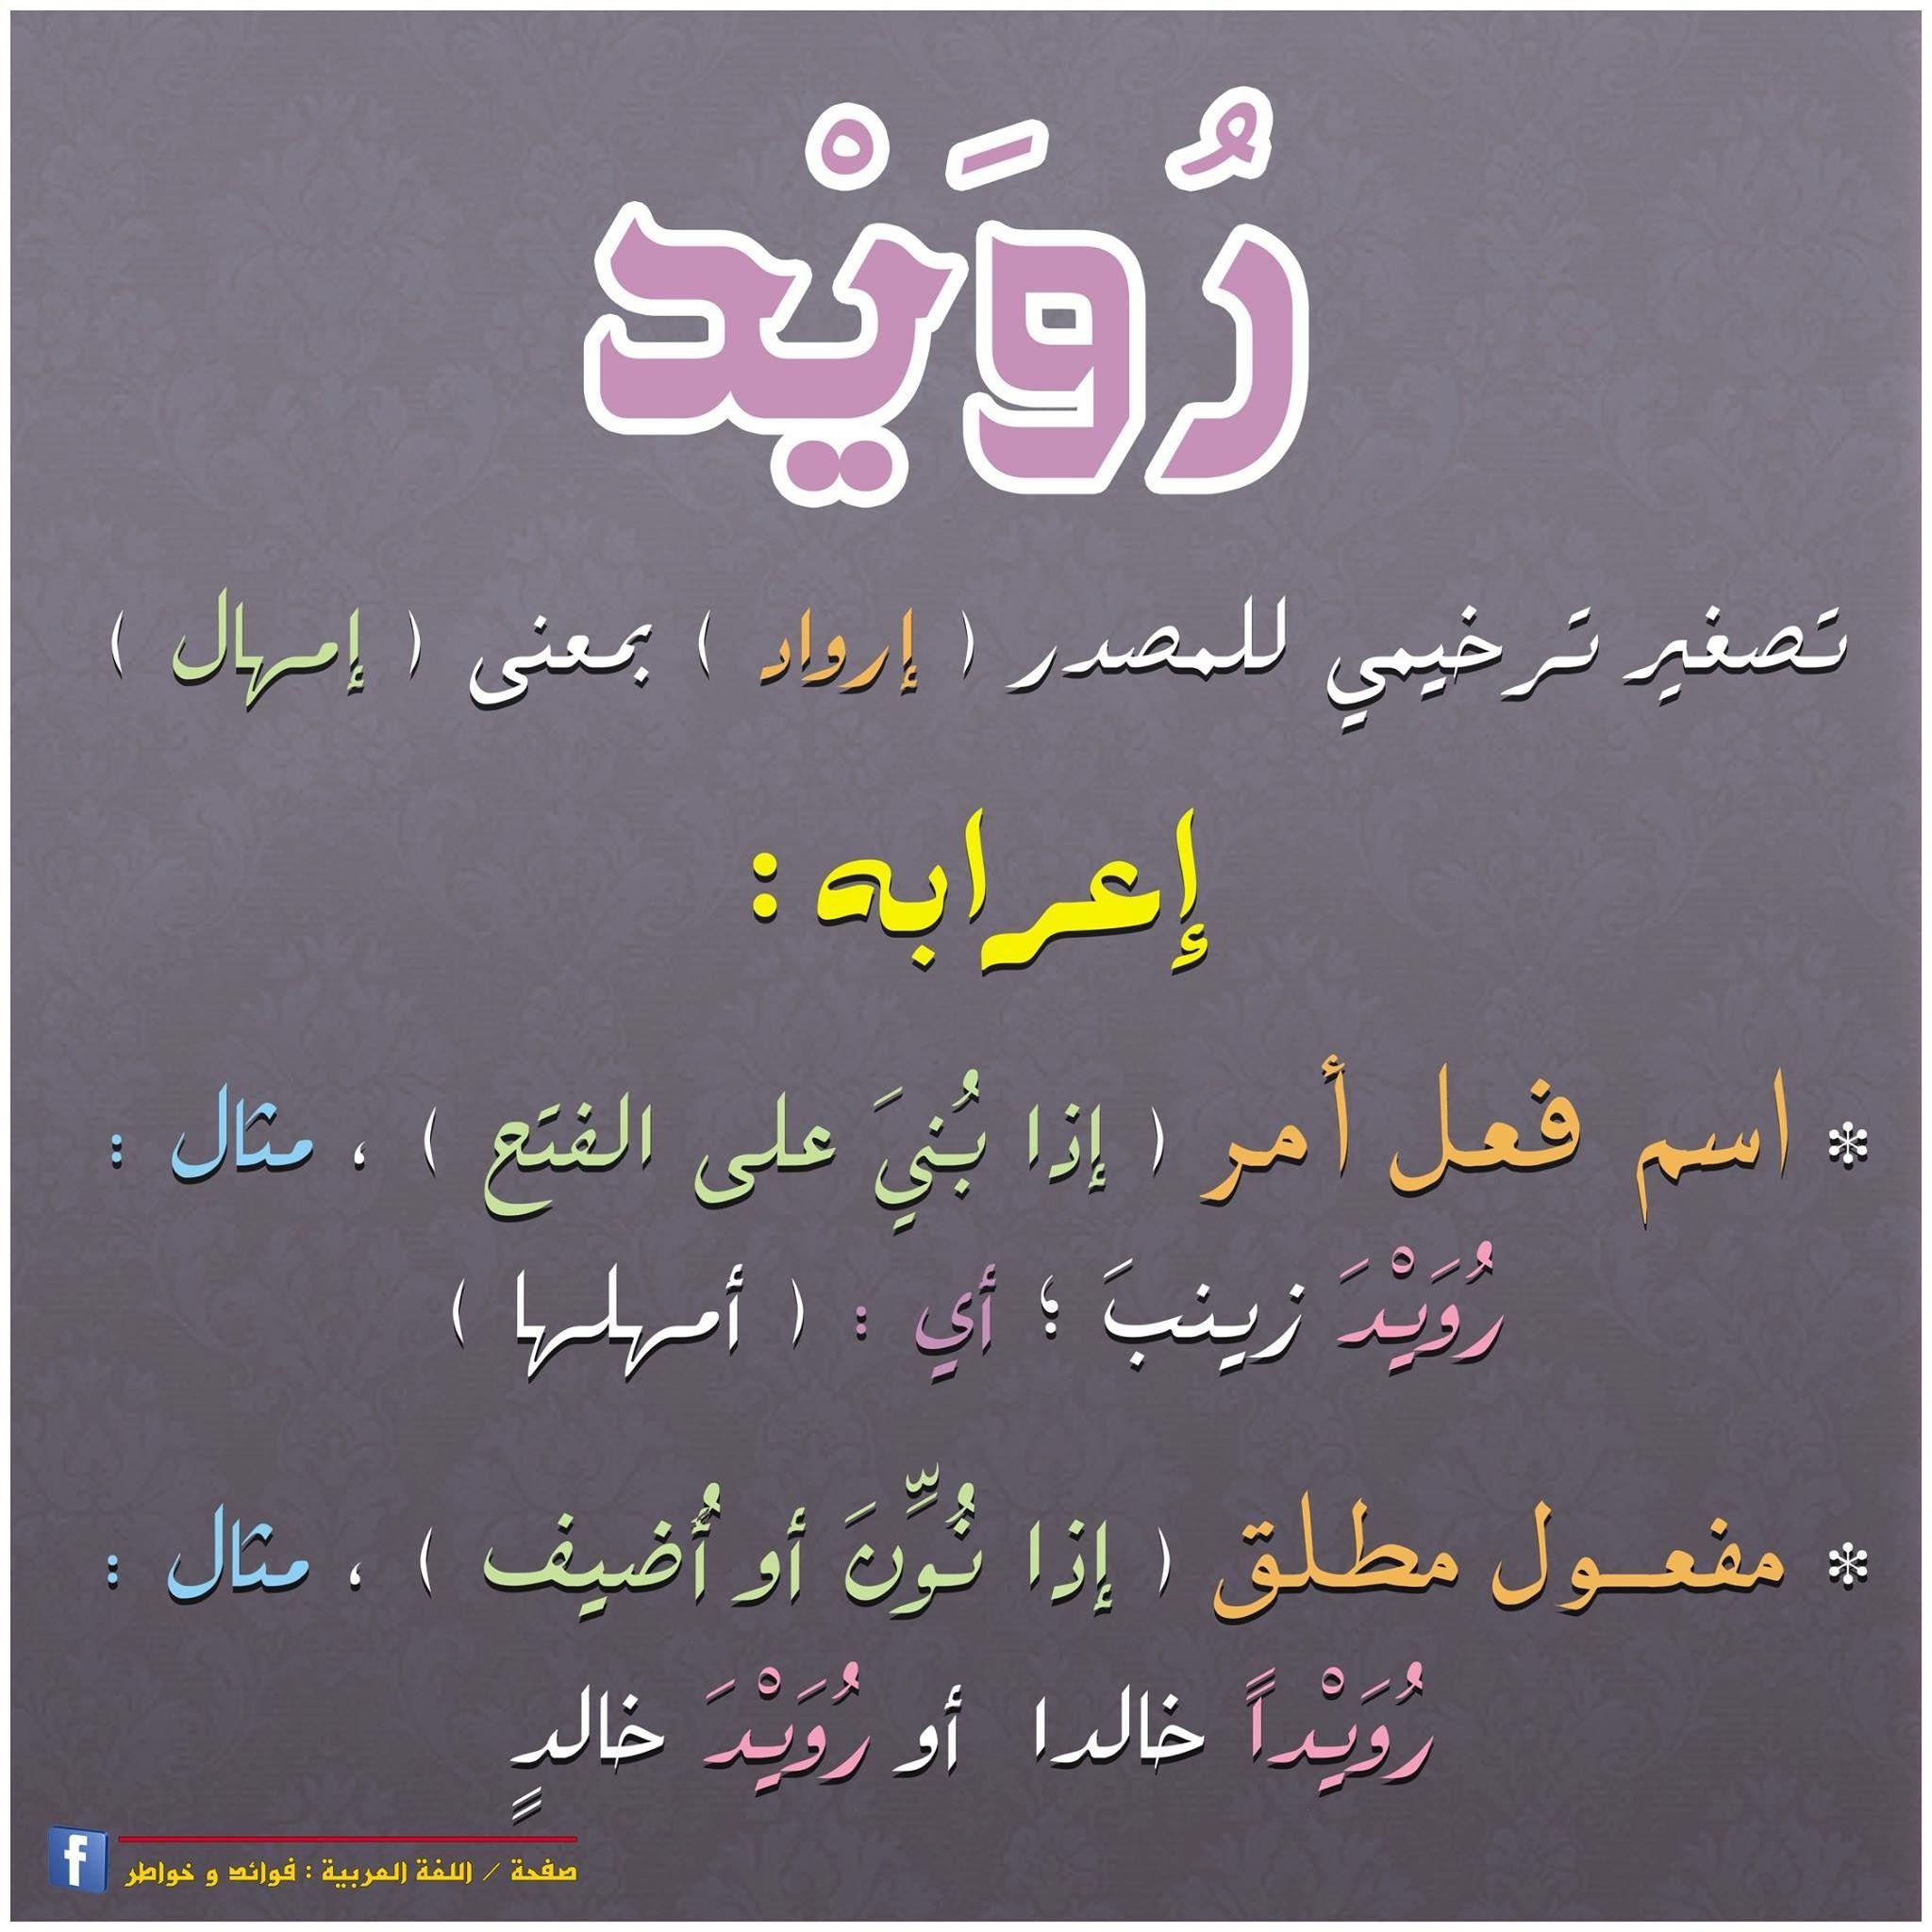 Pin By M A On العربية Arabic Language Beautiful Arabic Words Arabic Words